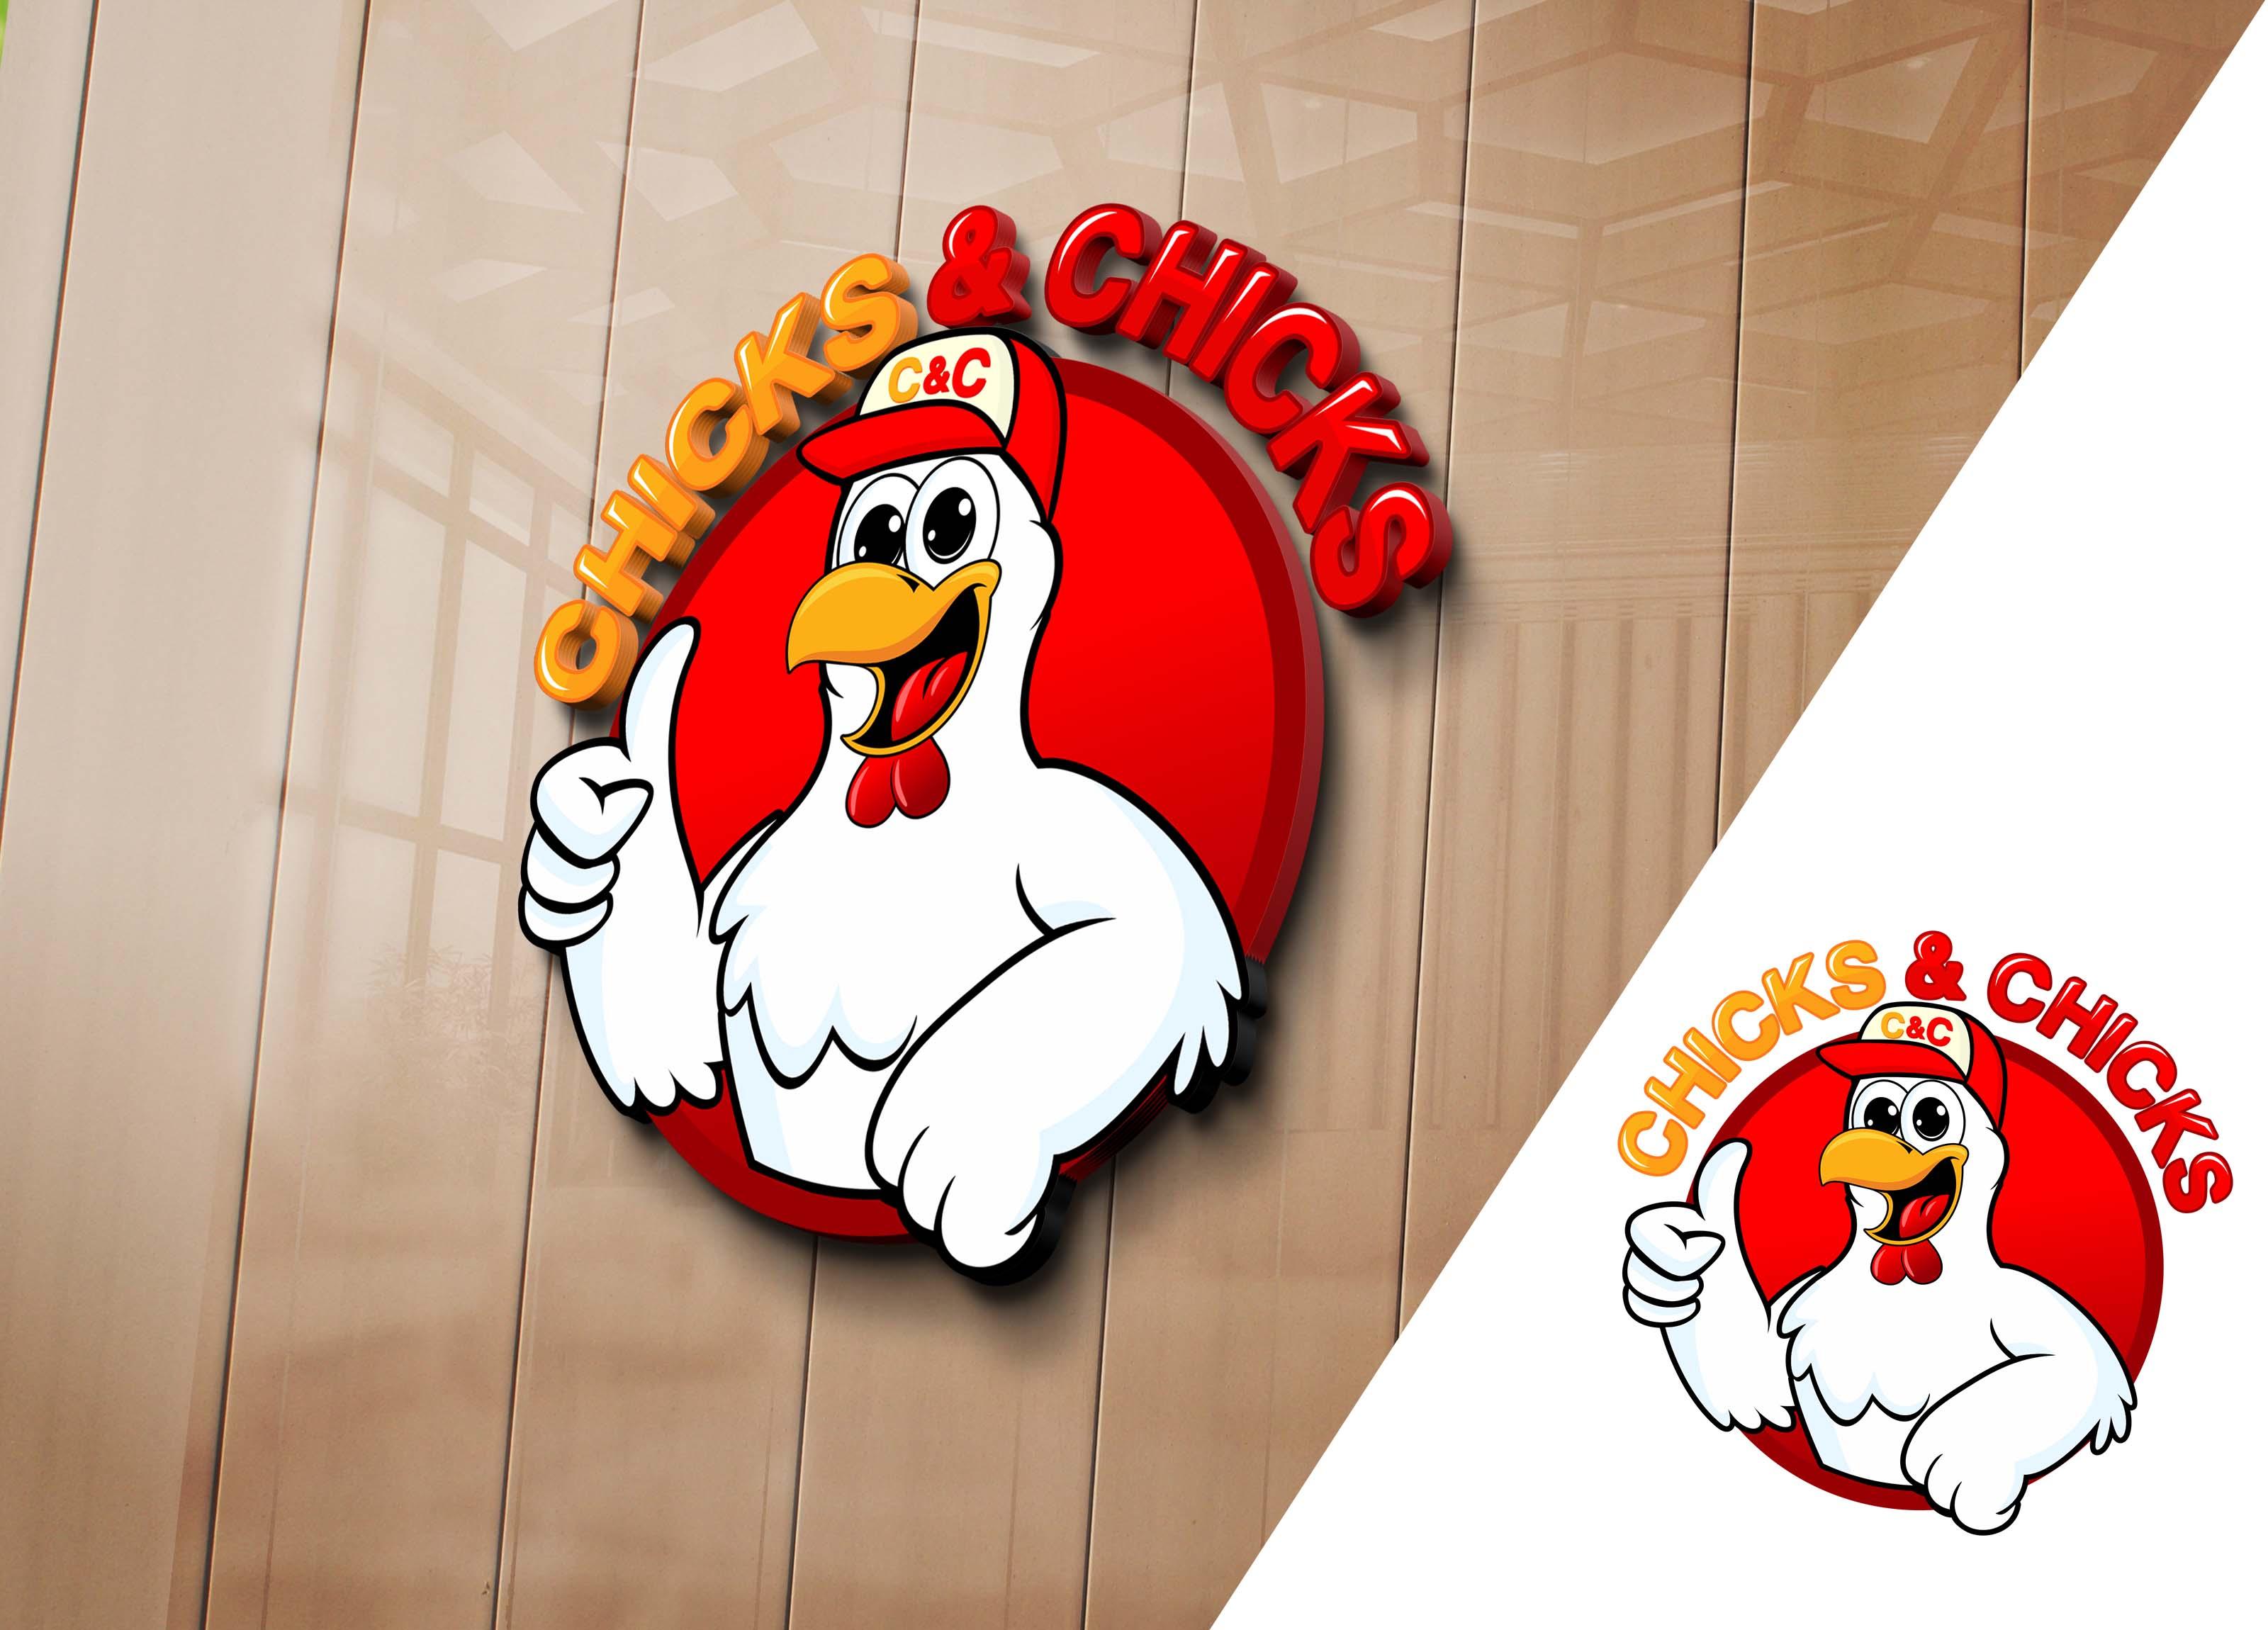 61+ Ide Desain Logo Fried Chicken HD Gratid Download Gratis